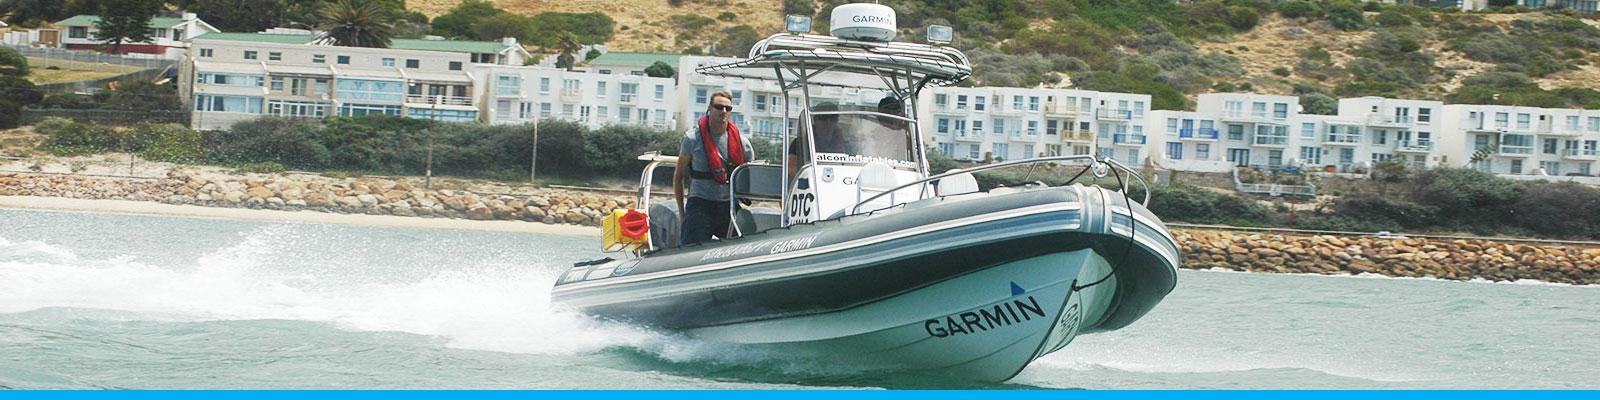 RYA-Advanced-Powerboat-Course